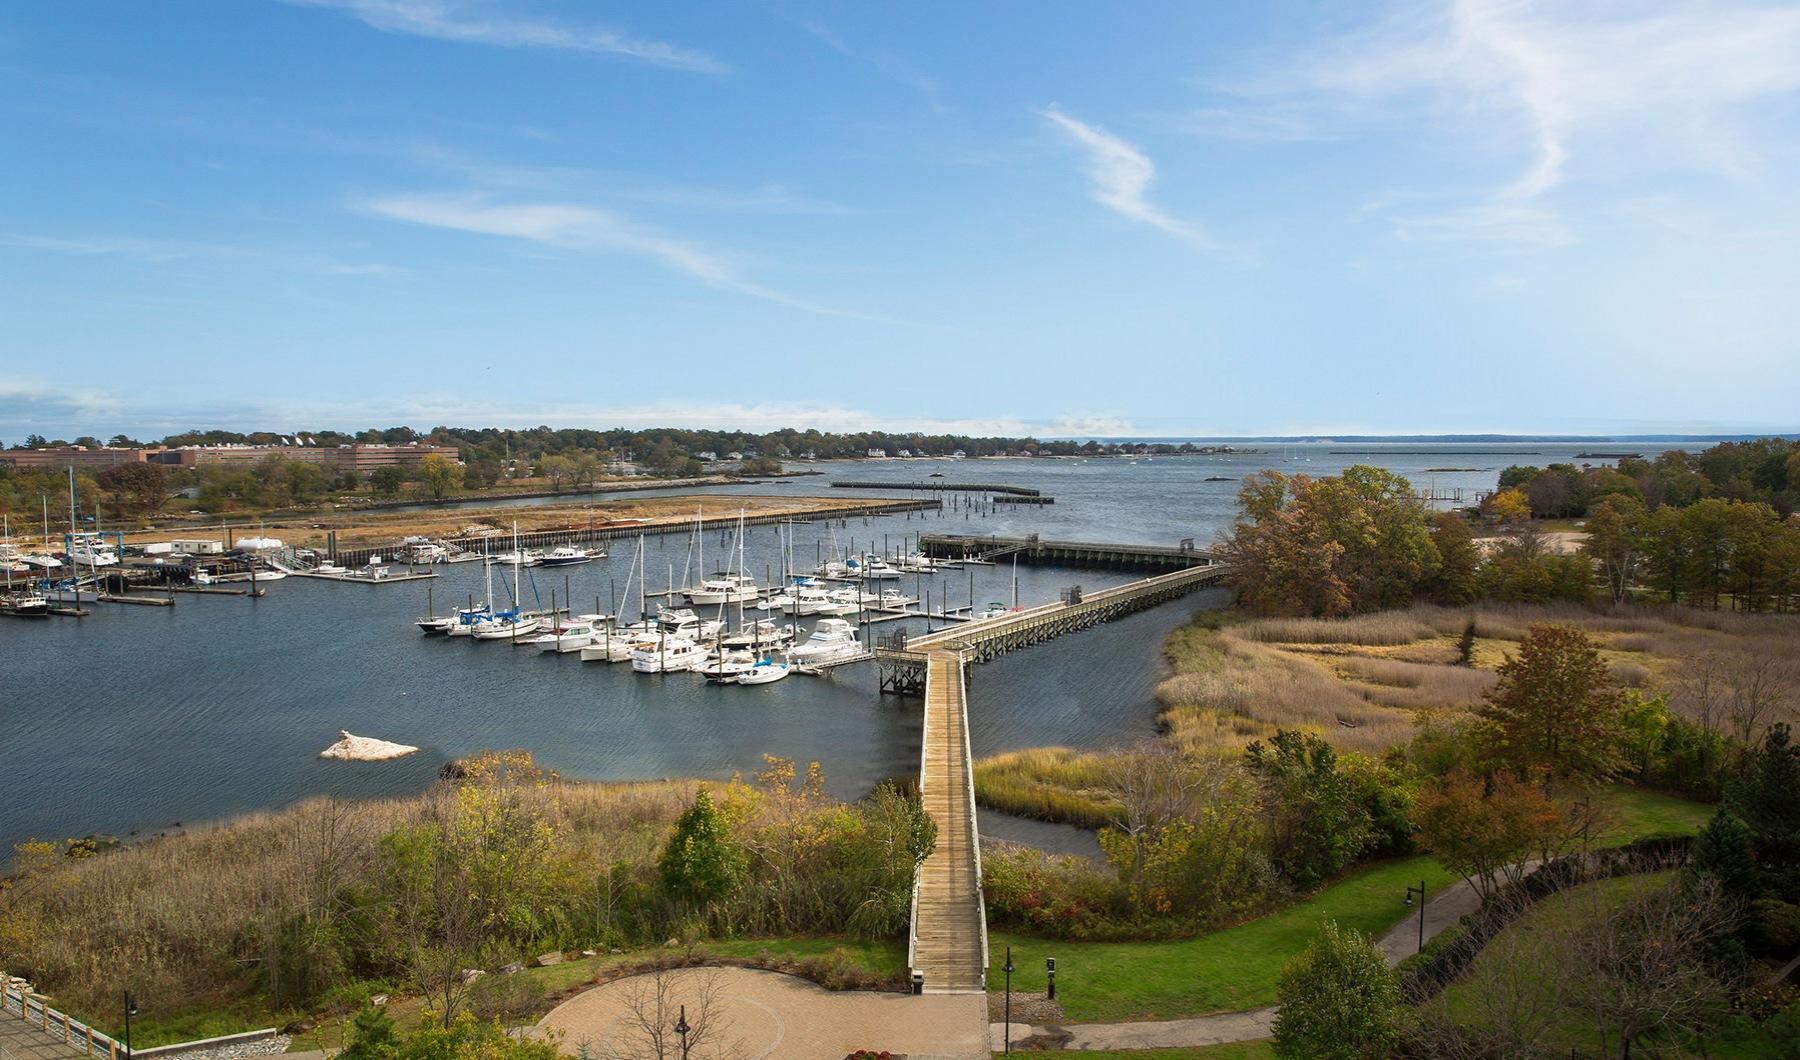 Resort-style Waterfront Residences